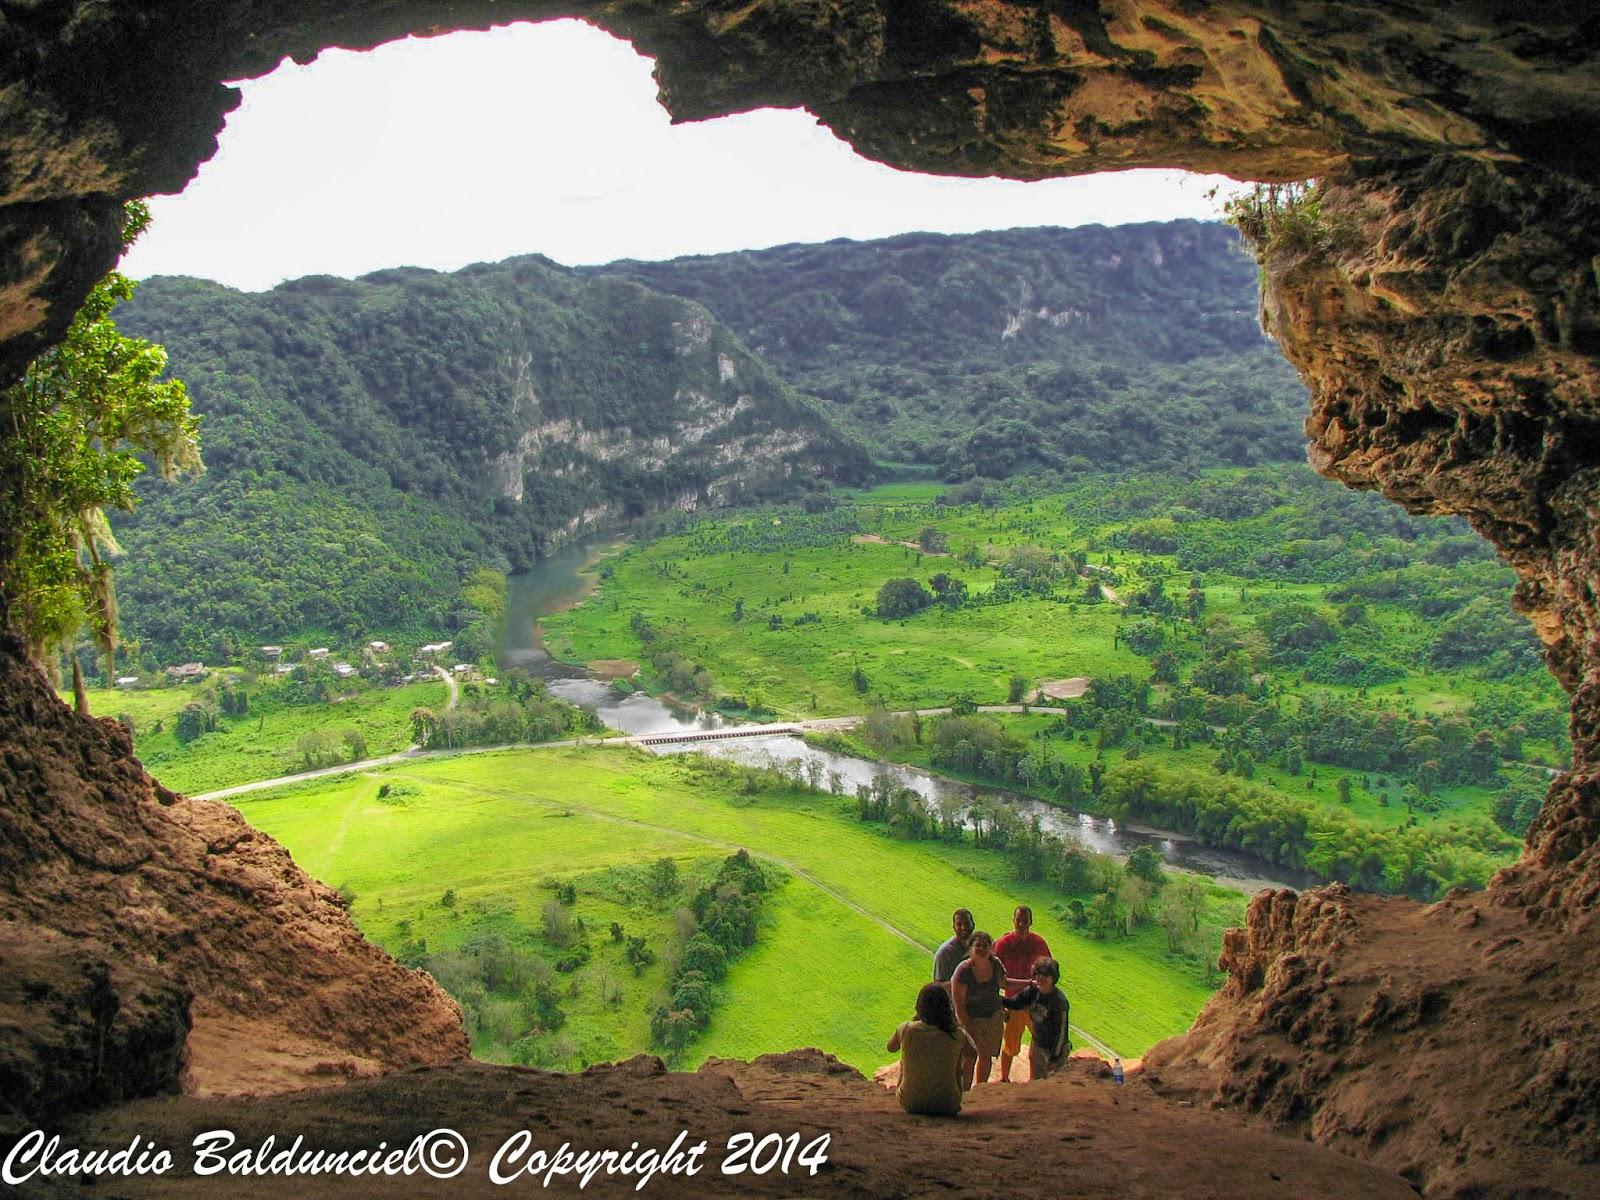 Cueva ventana arecibo puerto rico turismo interno for Turismo interno p r